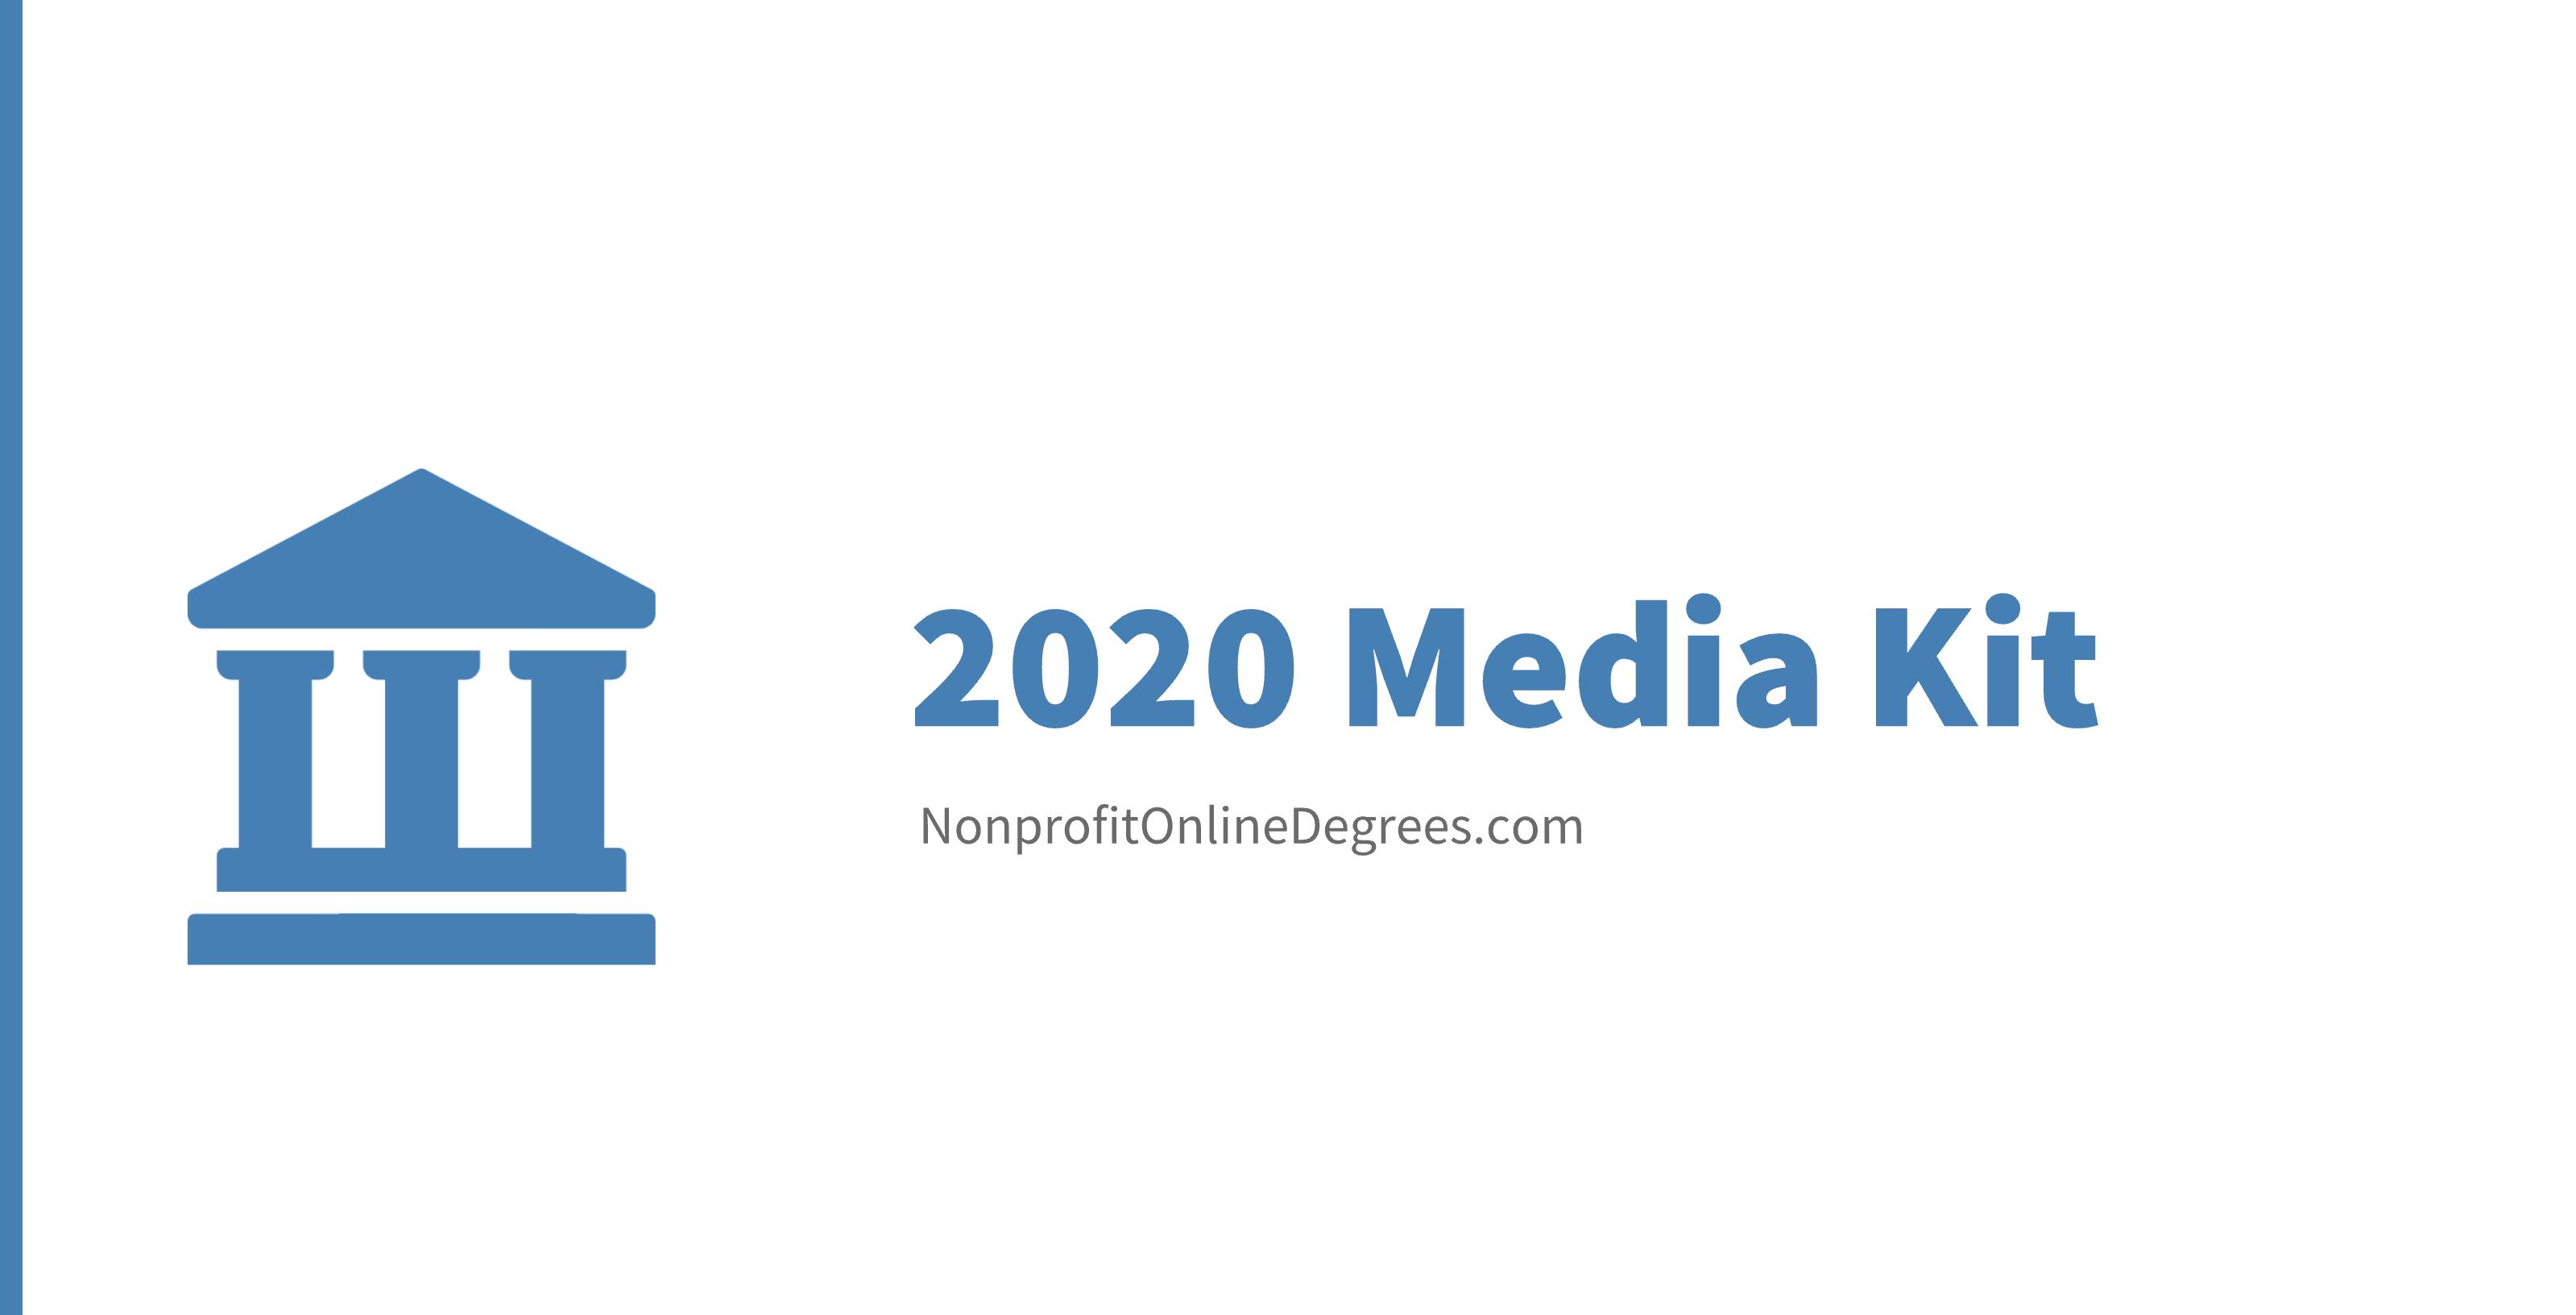 nonprofit online degrees media kit